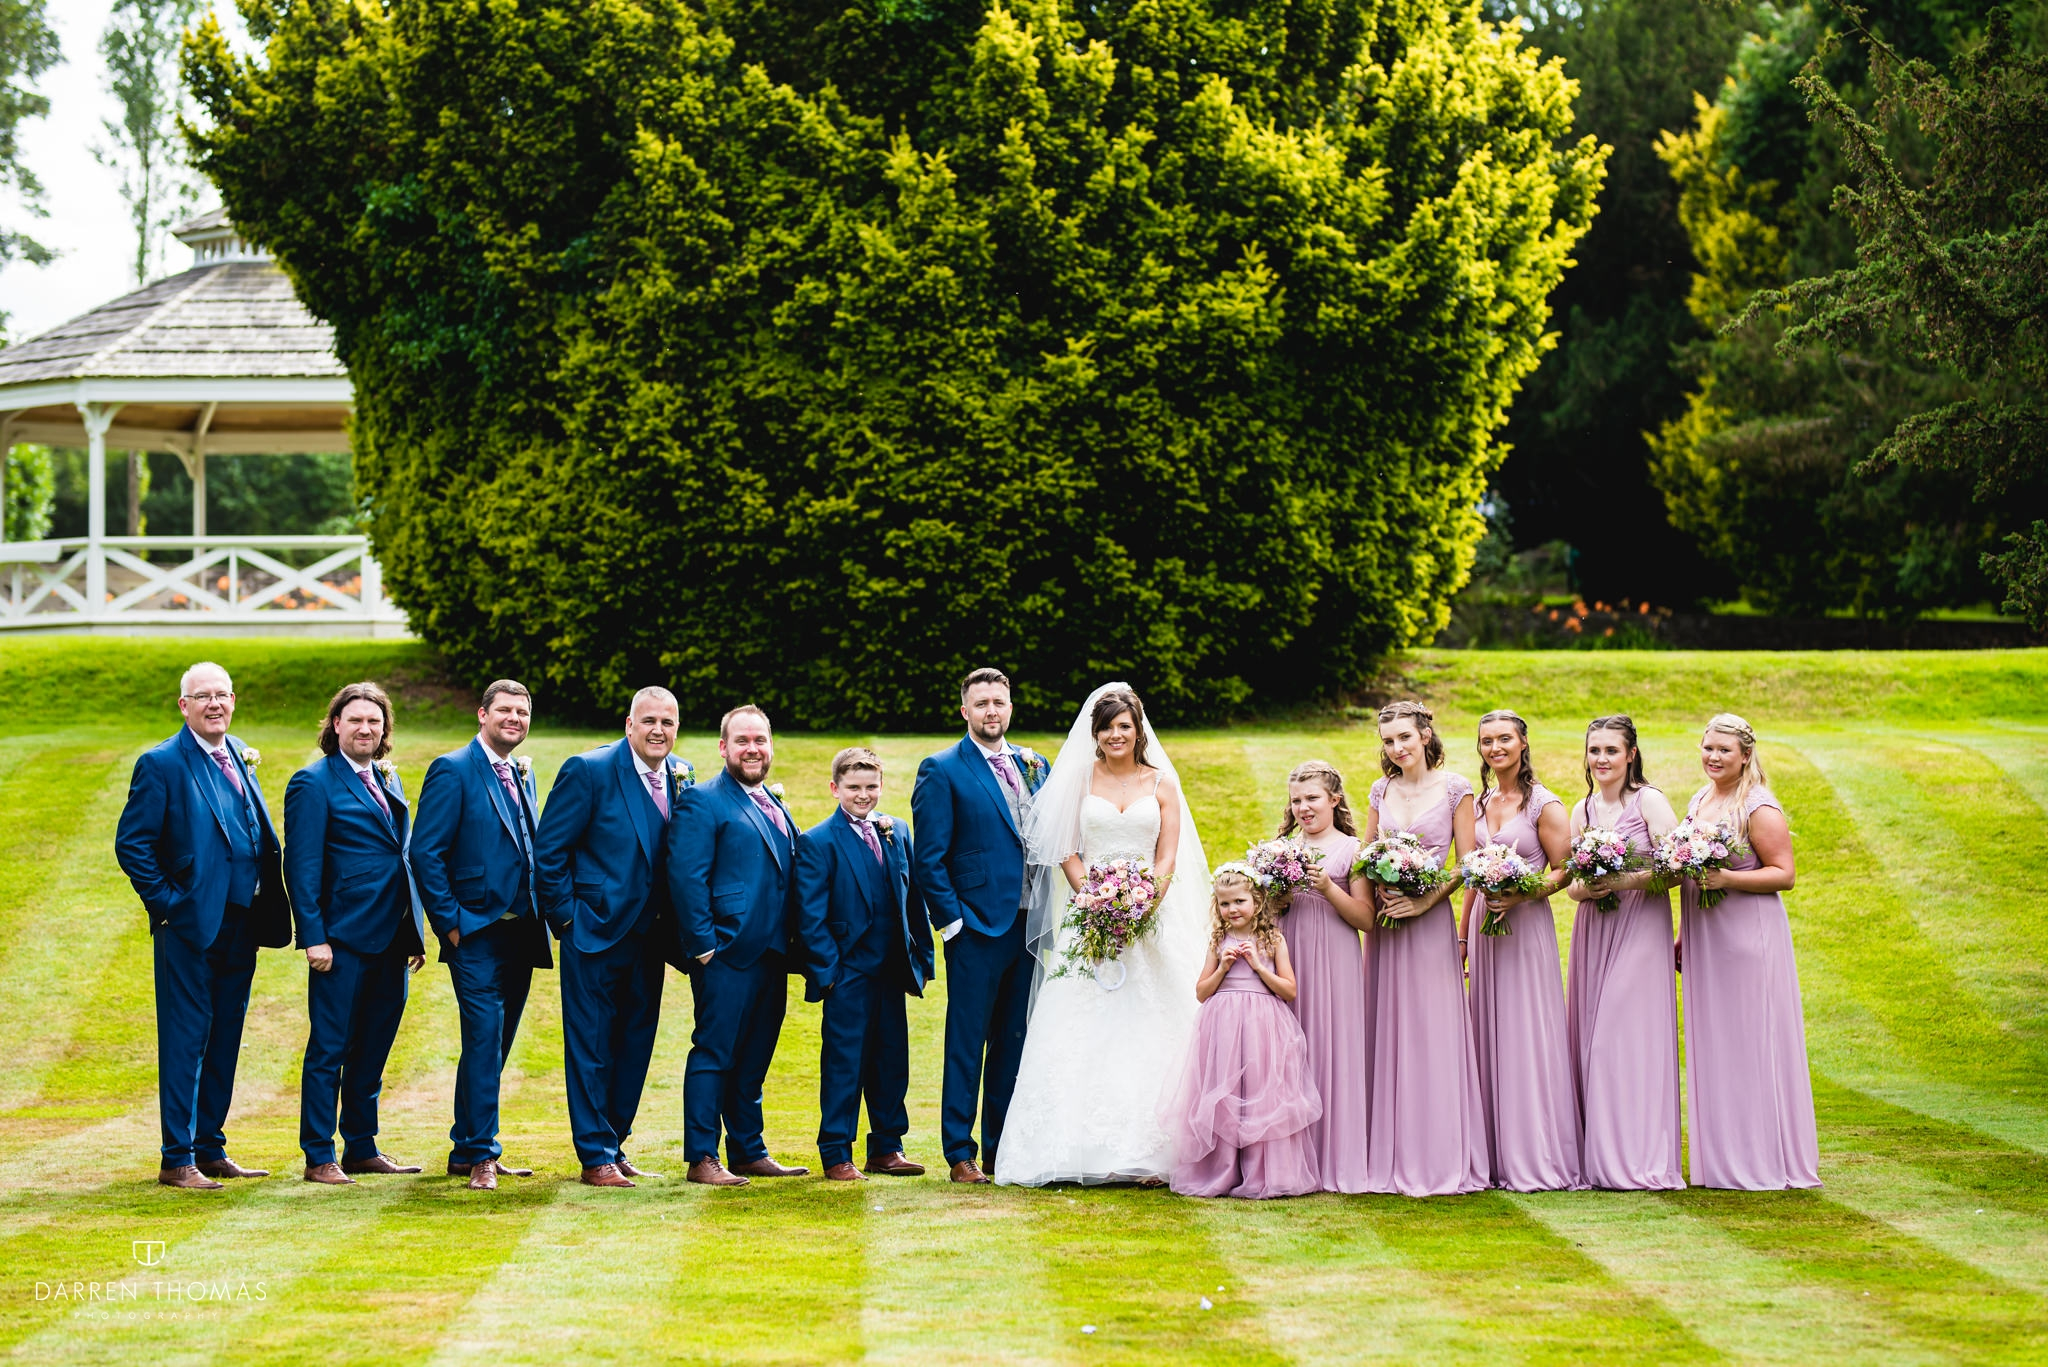 clearwell castle wedding_0009.jpg